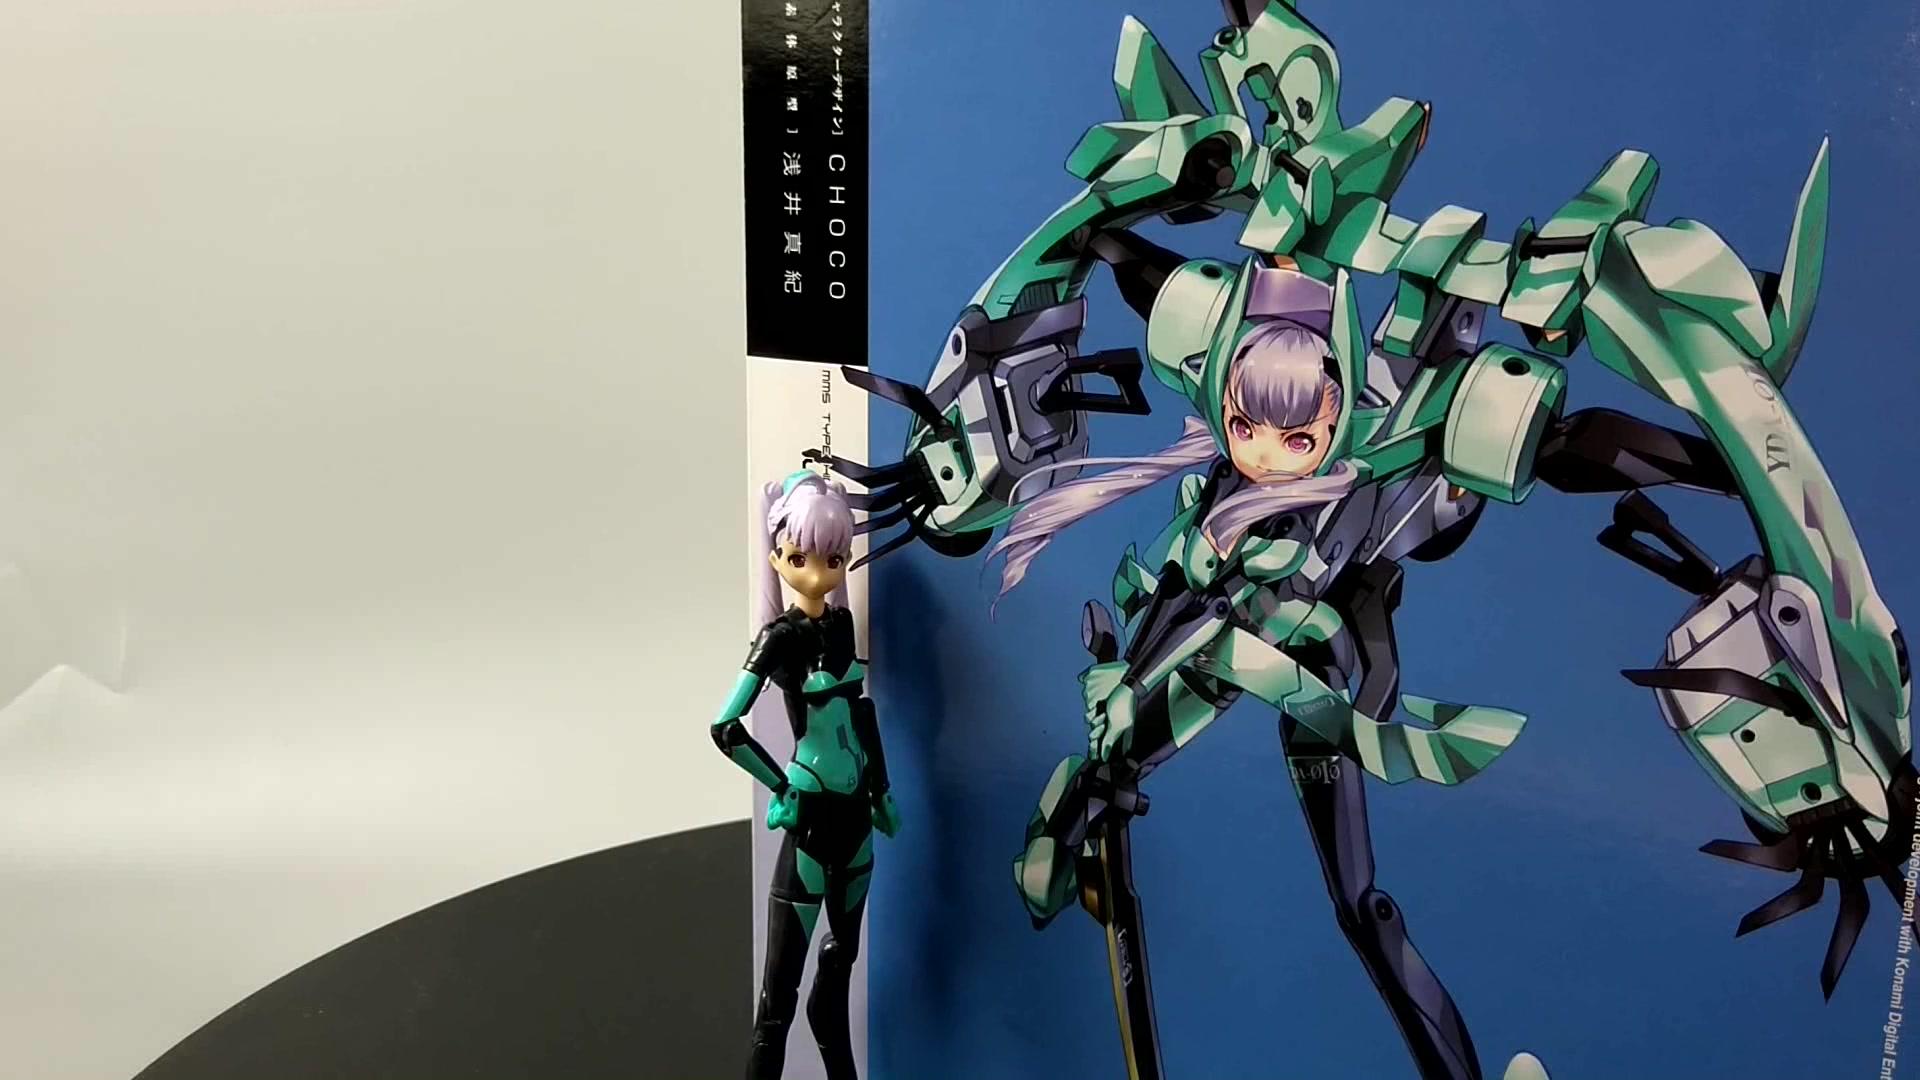 dada妲妲个人资料_【小6解说】总432期 武装神姬 高机动型 绿车伊妲